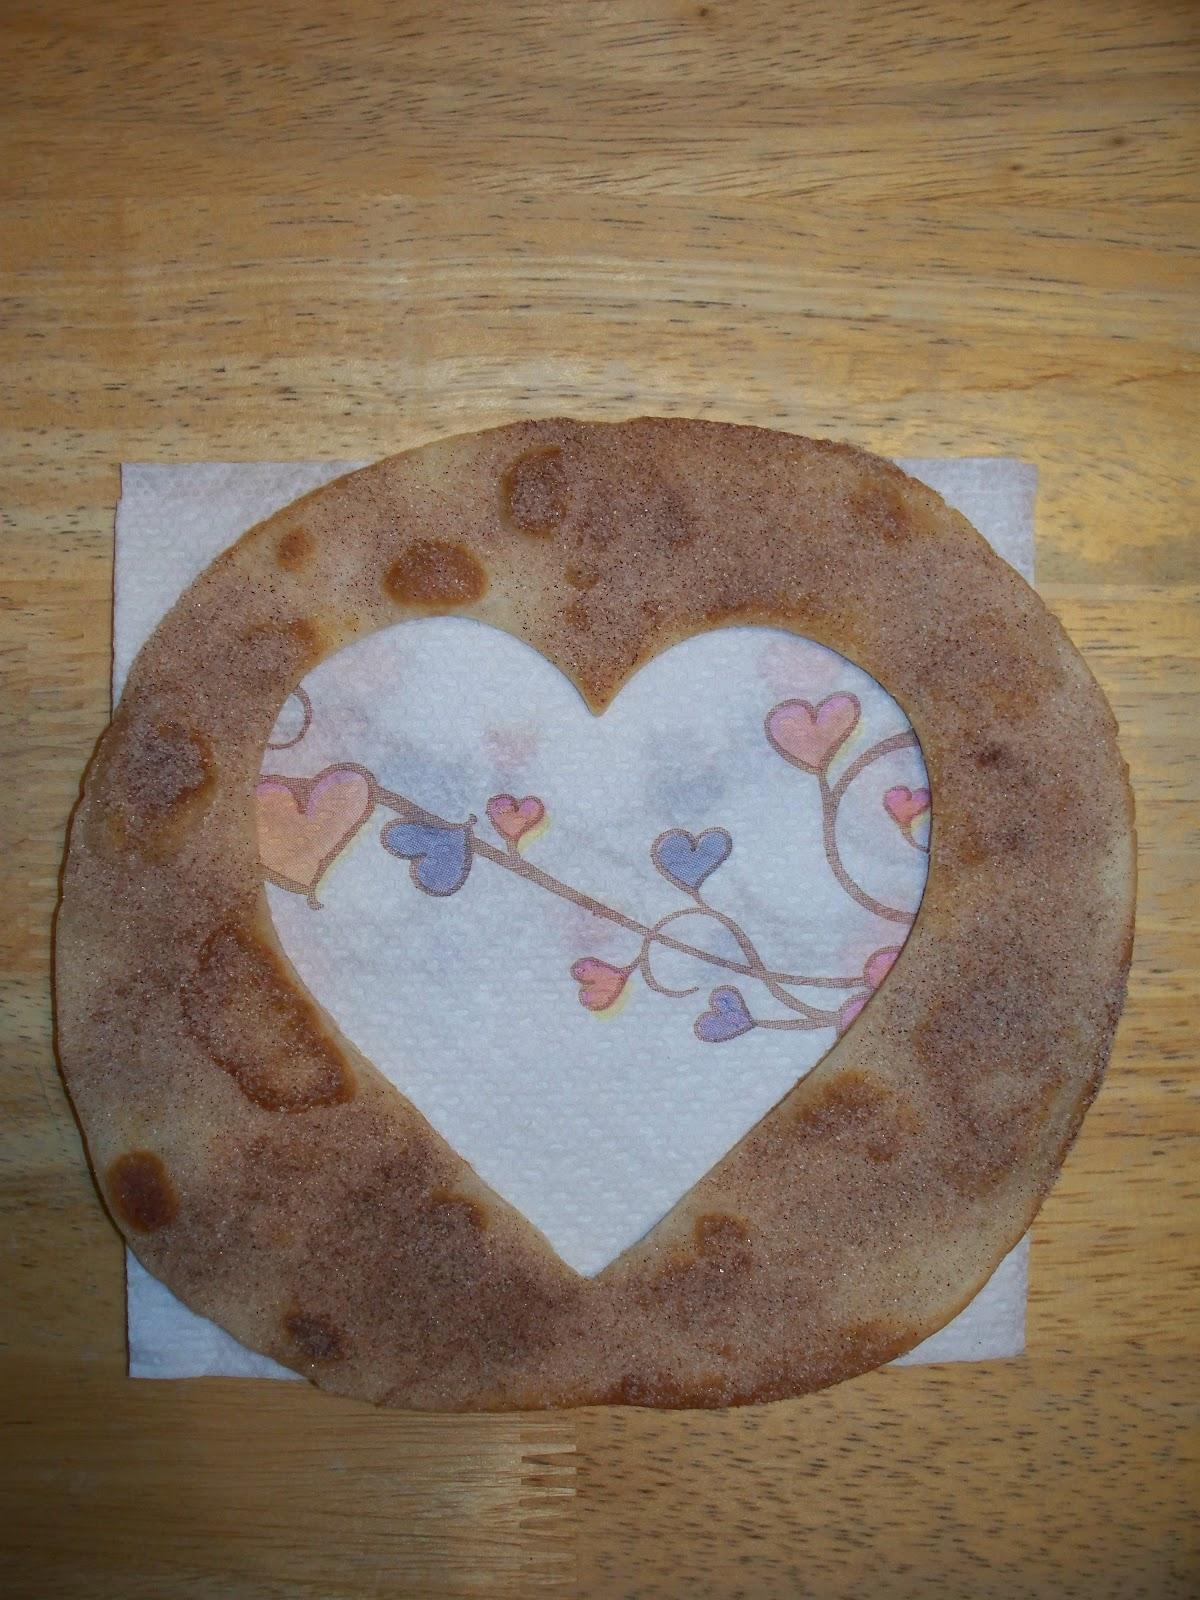 Koogles korner breakfast food love egg bullseye valentine style heart shaped altavistaventures Image collections